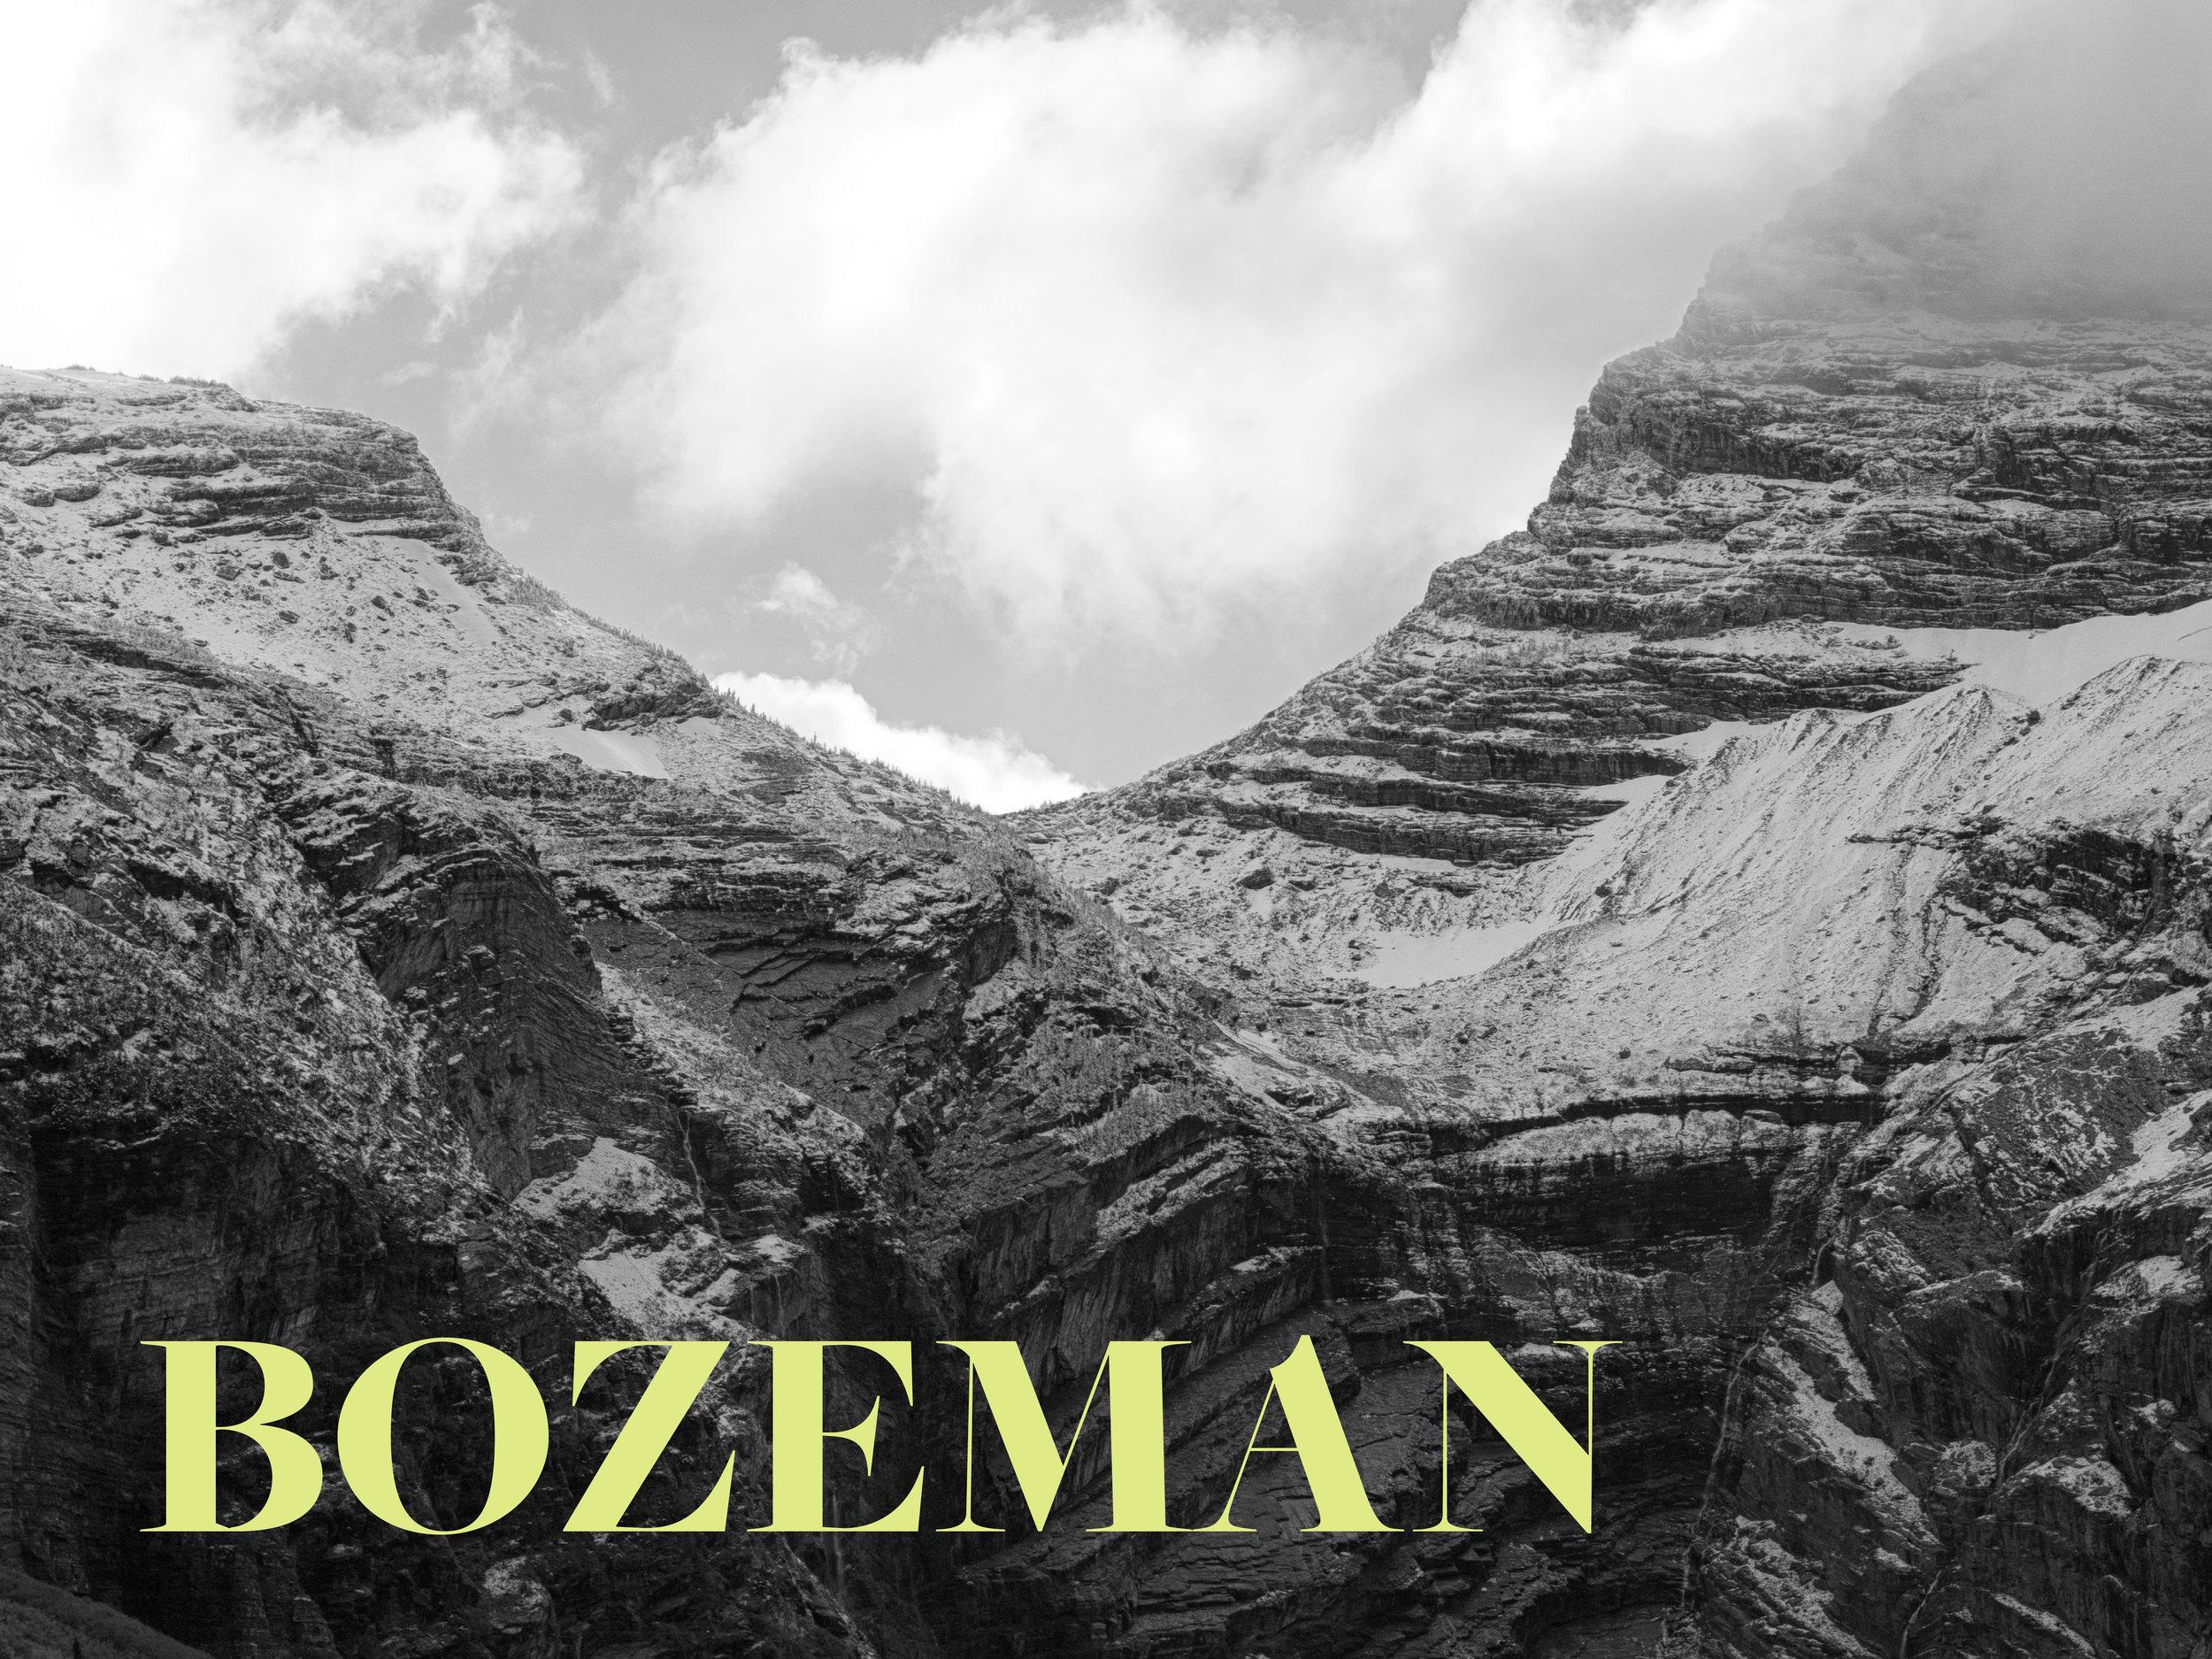 5 West Mendenhall,  Bozeman, Montana 59715